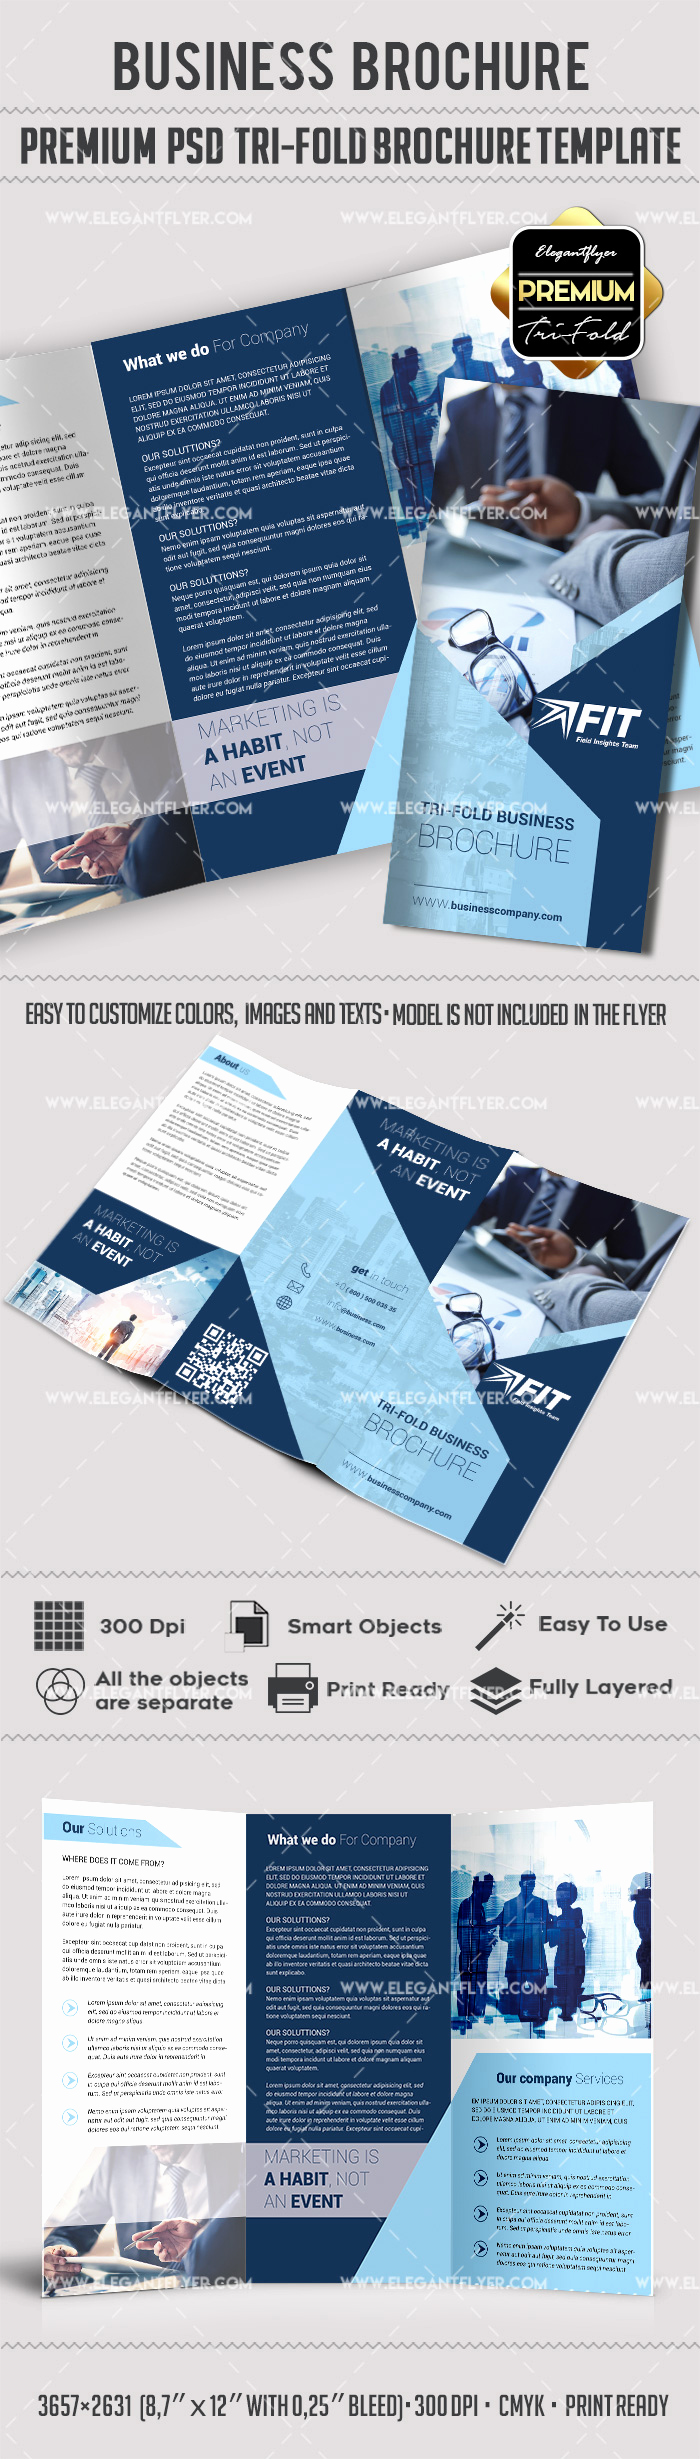 Tri Fold Brochure Template Psd Awesome Shop Brochure Template – by Elegantflyer